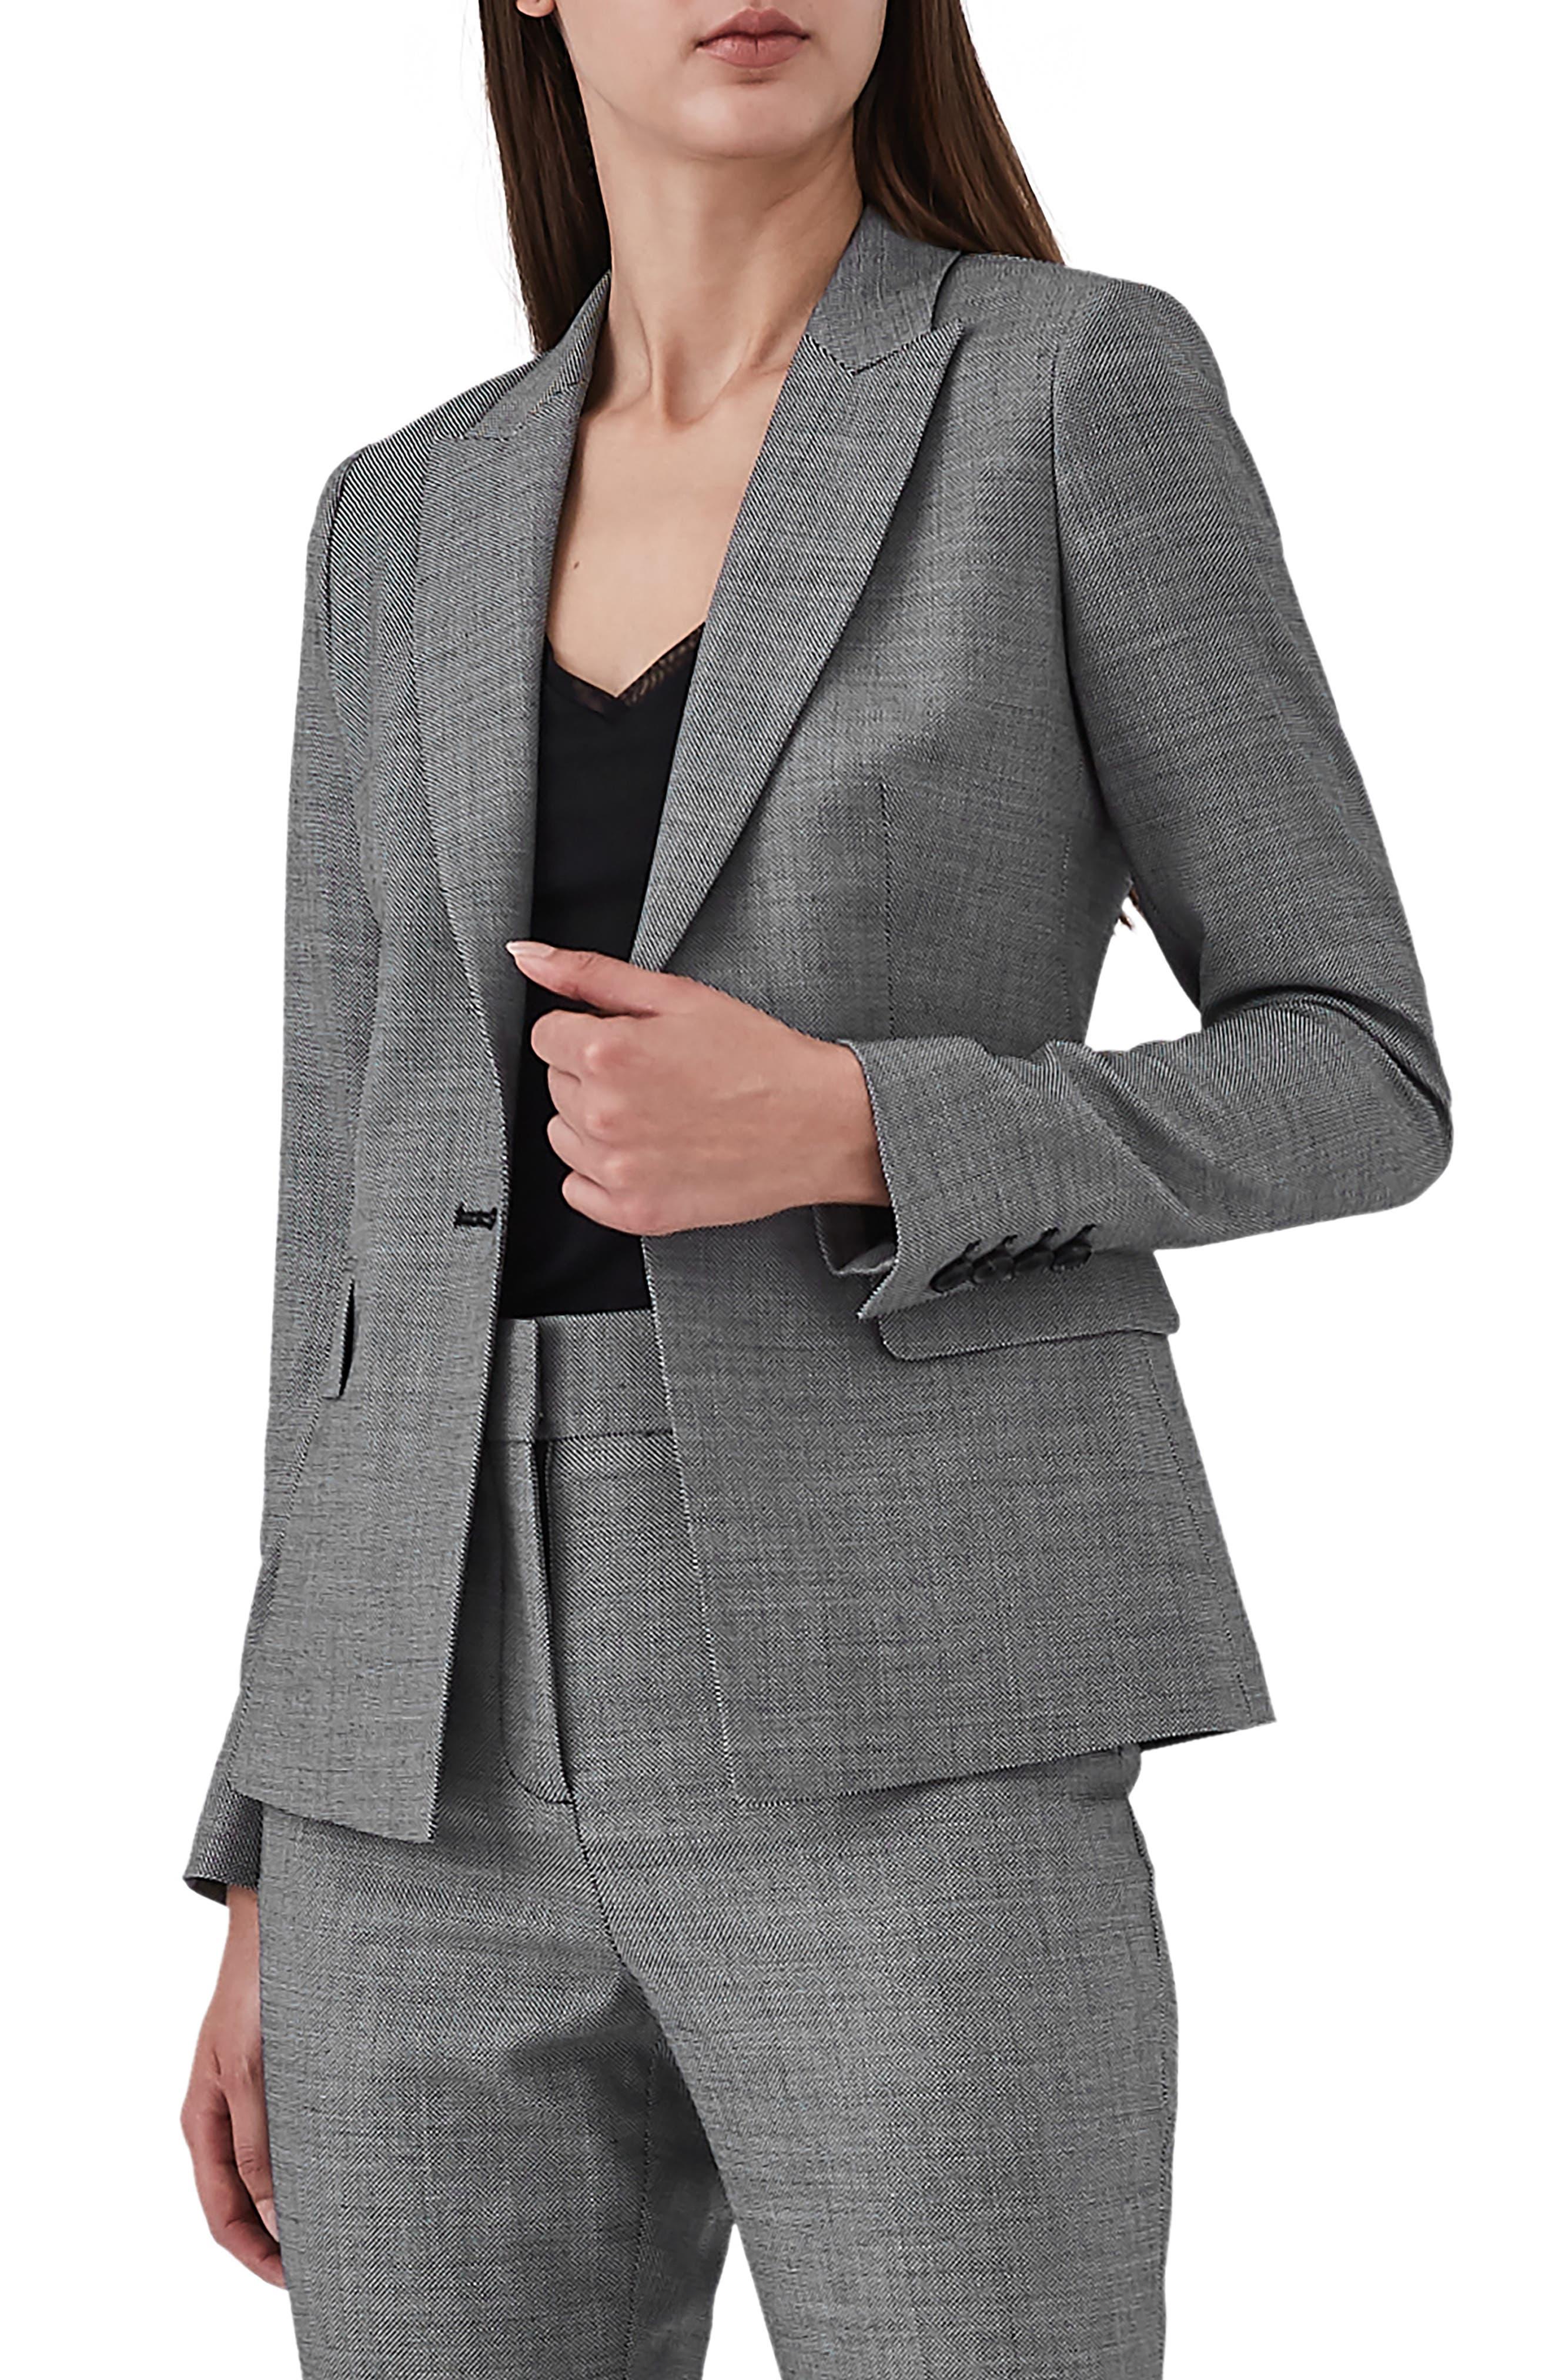 Alber Tweed Stretch Wool Blend Blazer,                             Main thumbnail 1, color,                             GREY